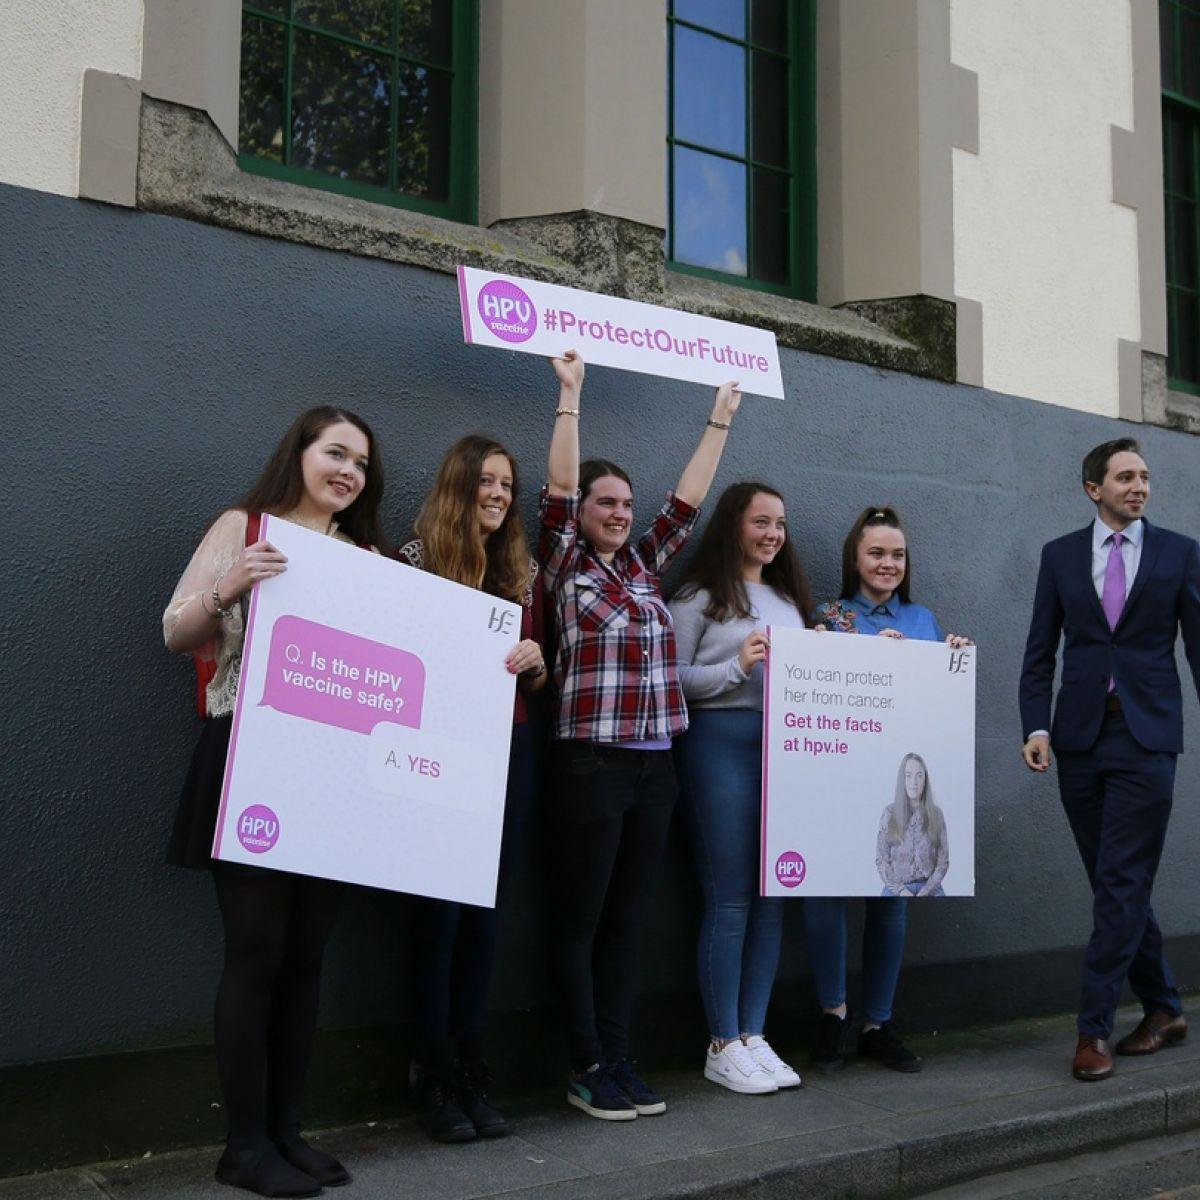 Watch Girls Who Get HPV Vaccine Still Value Safe Sex video